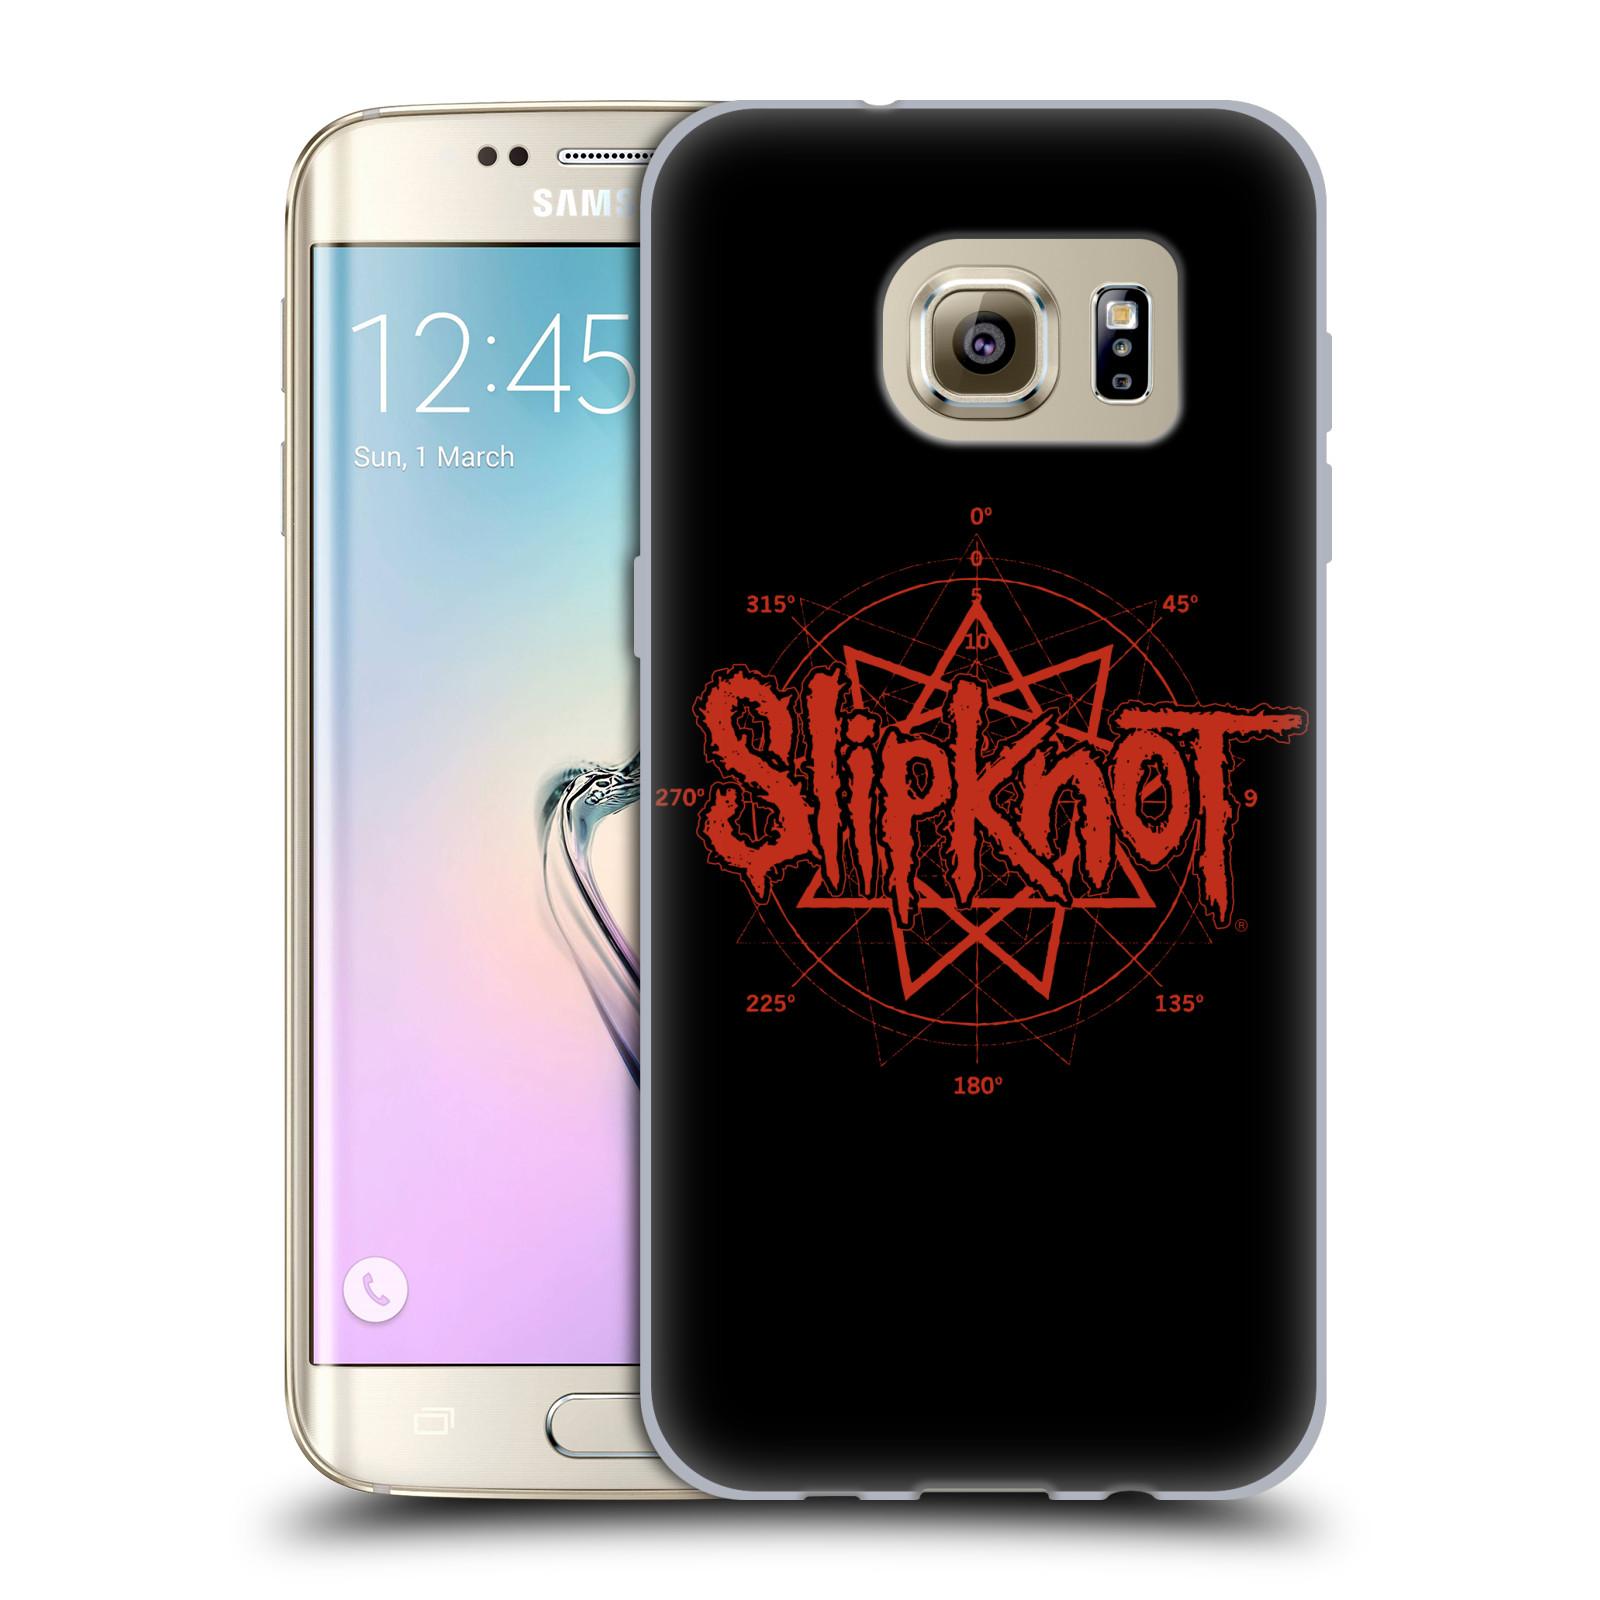 HEAD CASE silikonový obal na mobil Samsung Galaxy S7 EDGE hudební skupina Slipknot logo